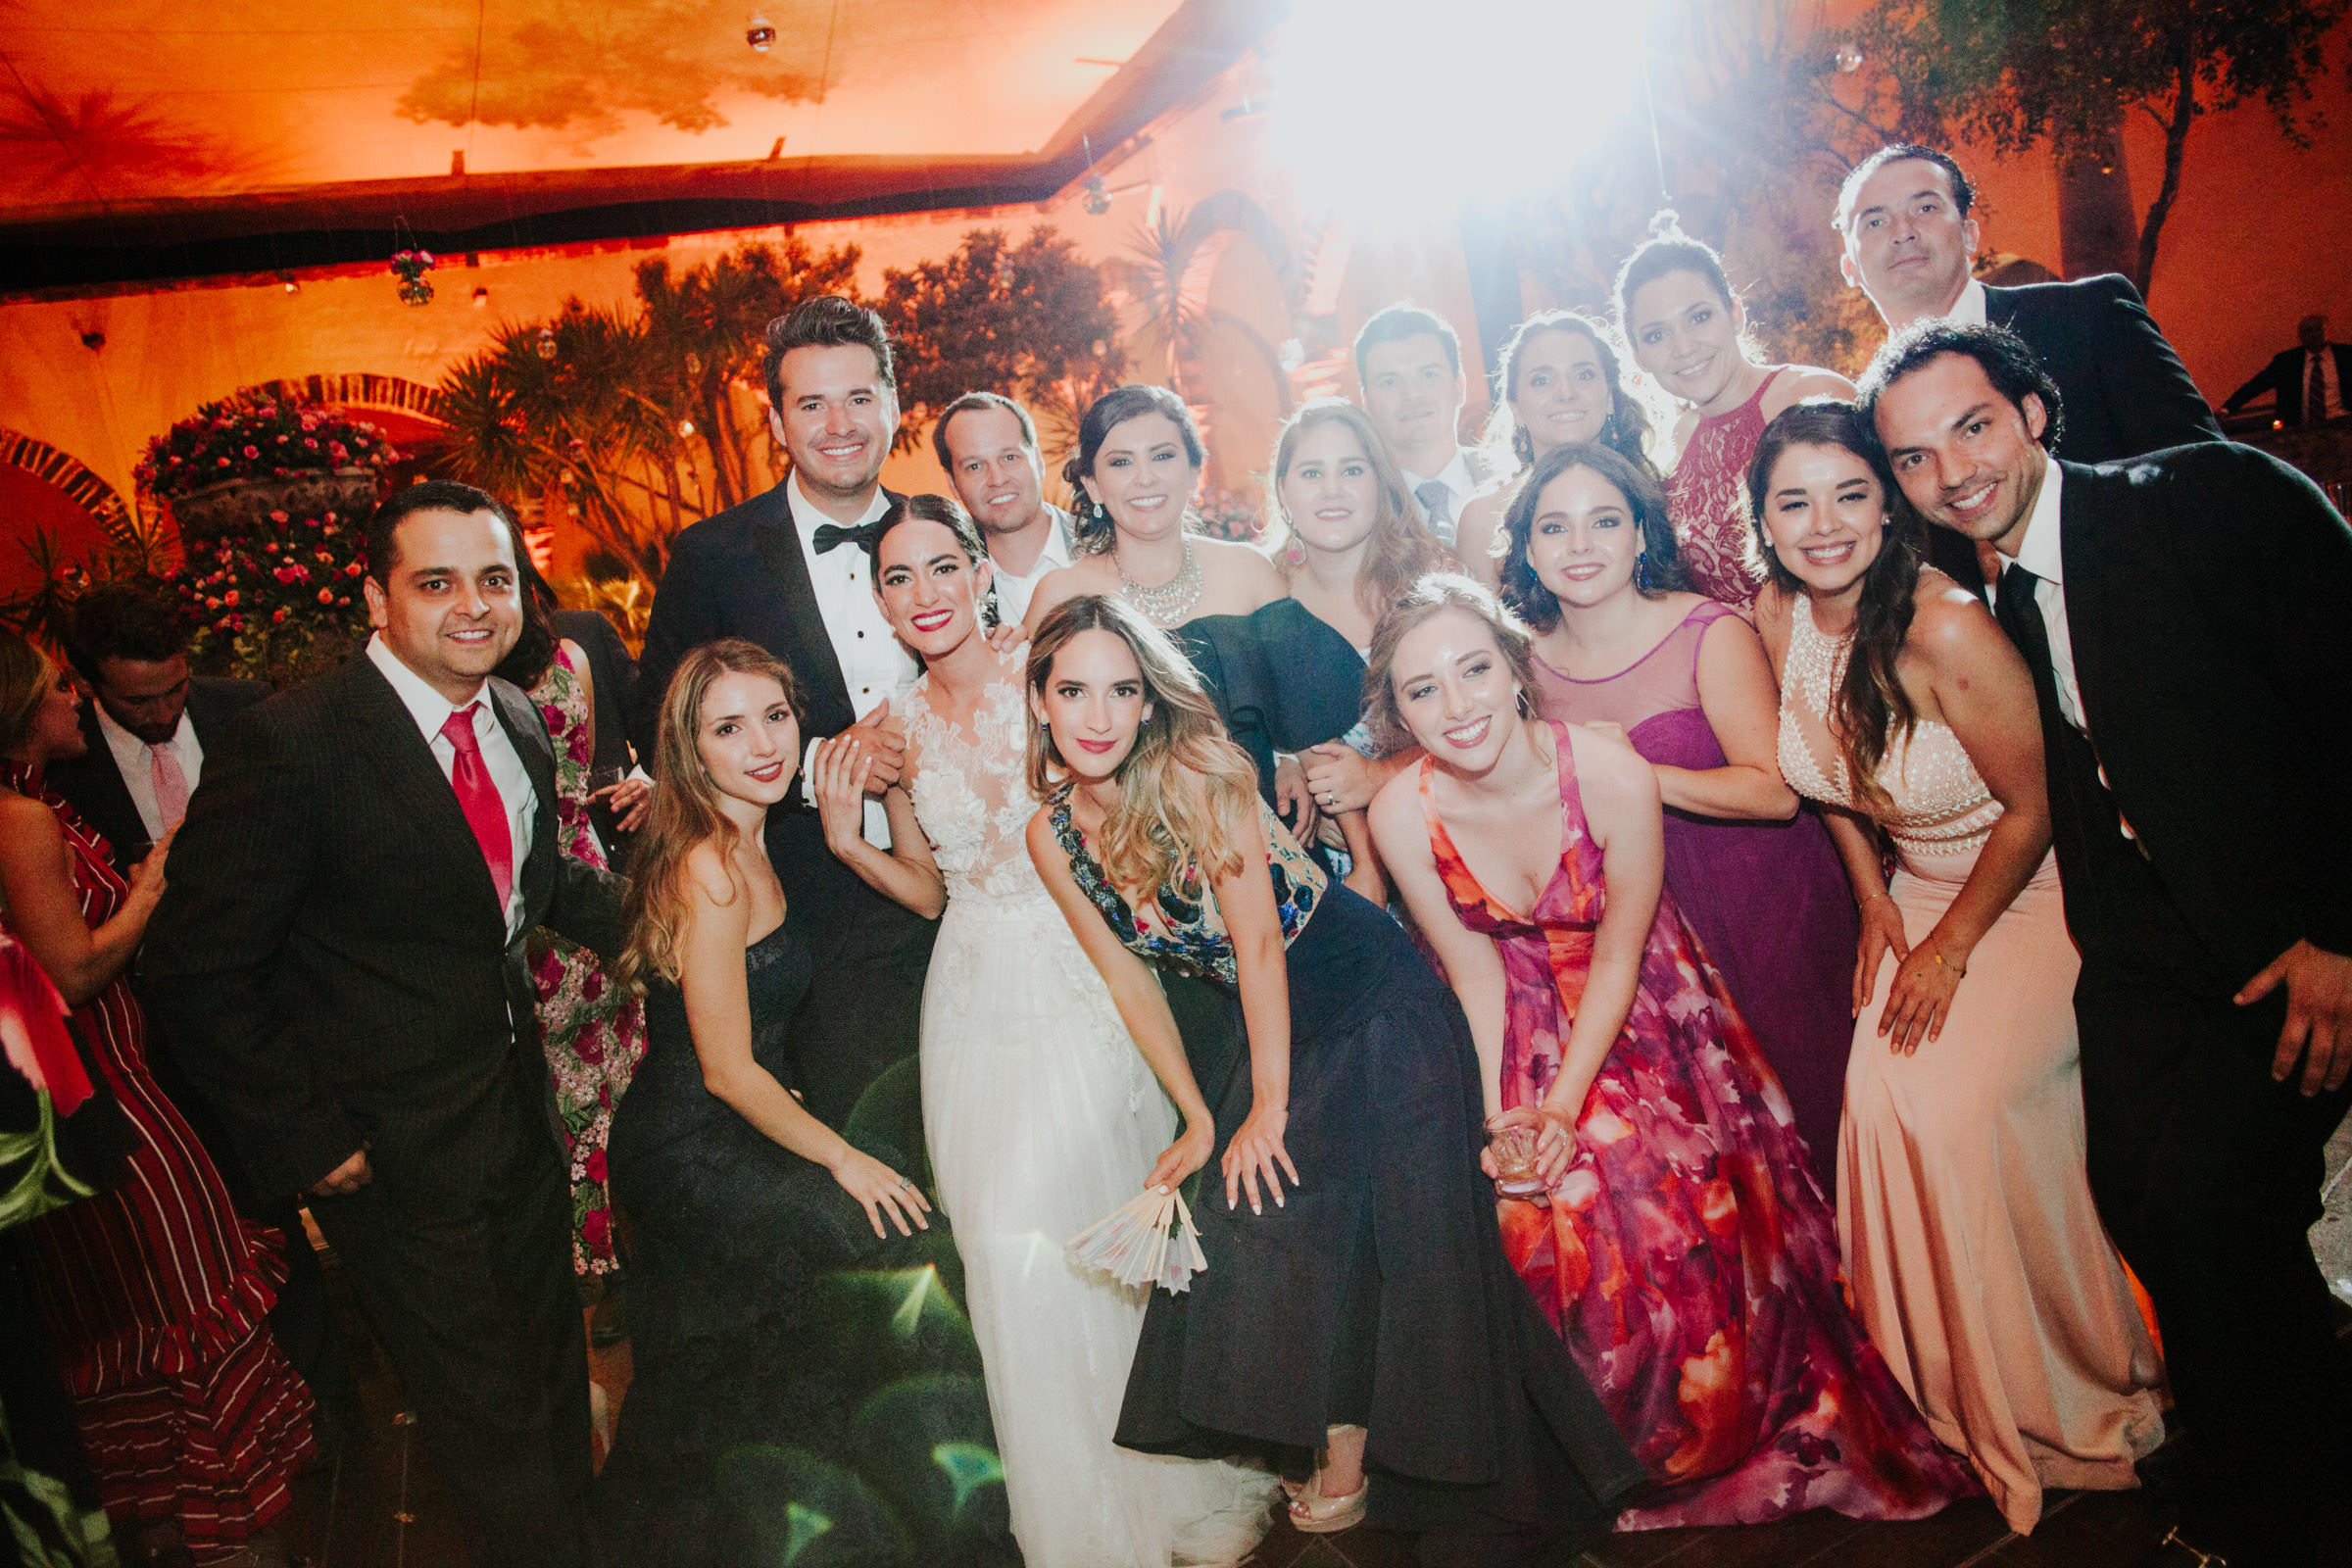 San-Miguel-de-Allende-Wedding-Photography-Parroquia-Instituto-Boda-Fotografia-Fer-Sergio-Pierce-Lifestyle-Photography0076.JPG